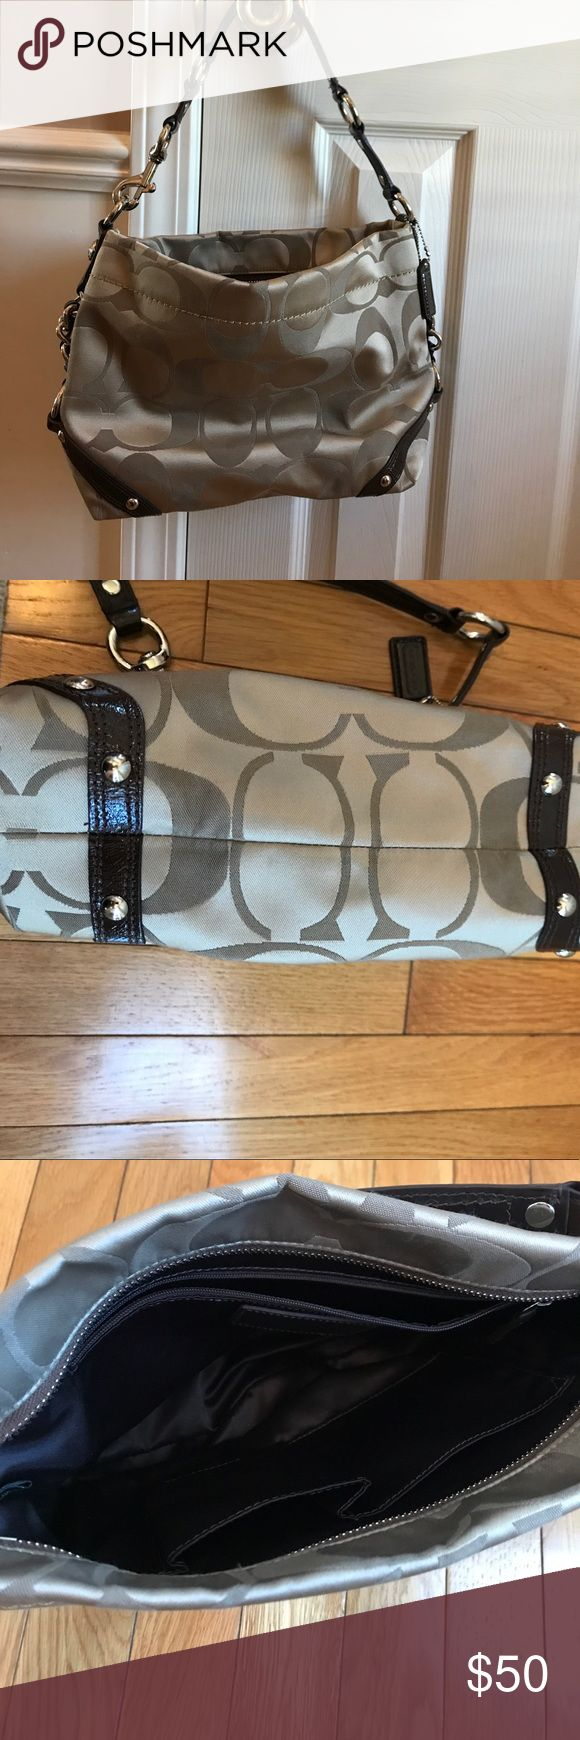 Coach purse,  beige/brown.  Short handle.  Clean. Coach purse,  beige/brown.  Short handle.  Clean.  Smoke free house Coach Bags Totes